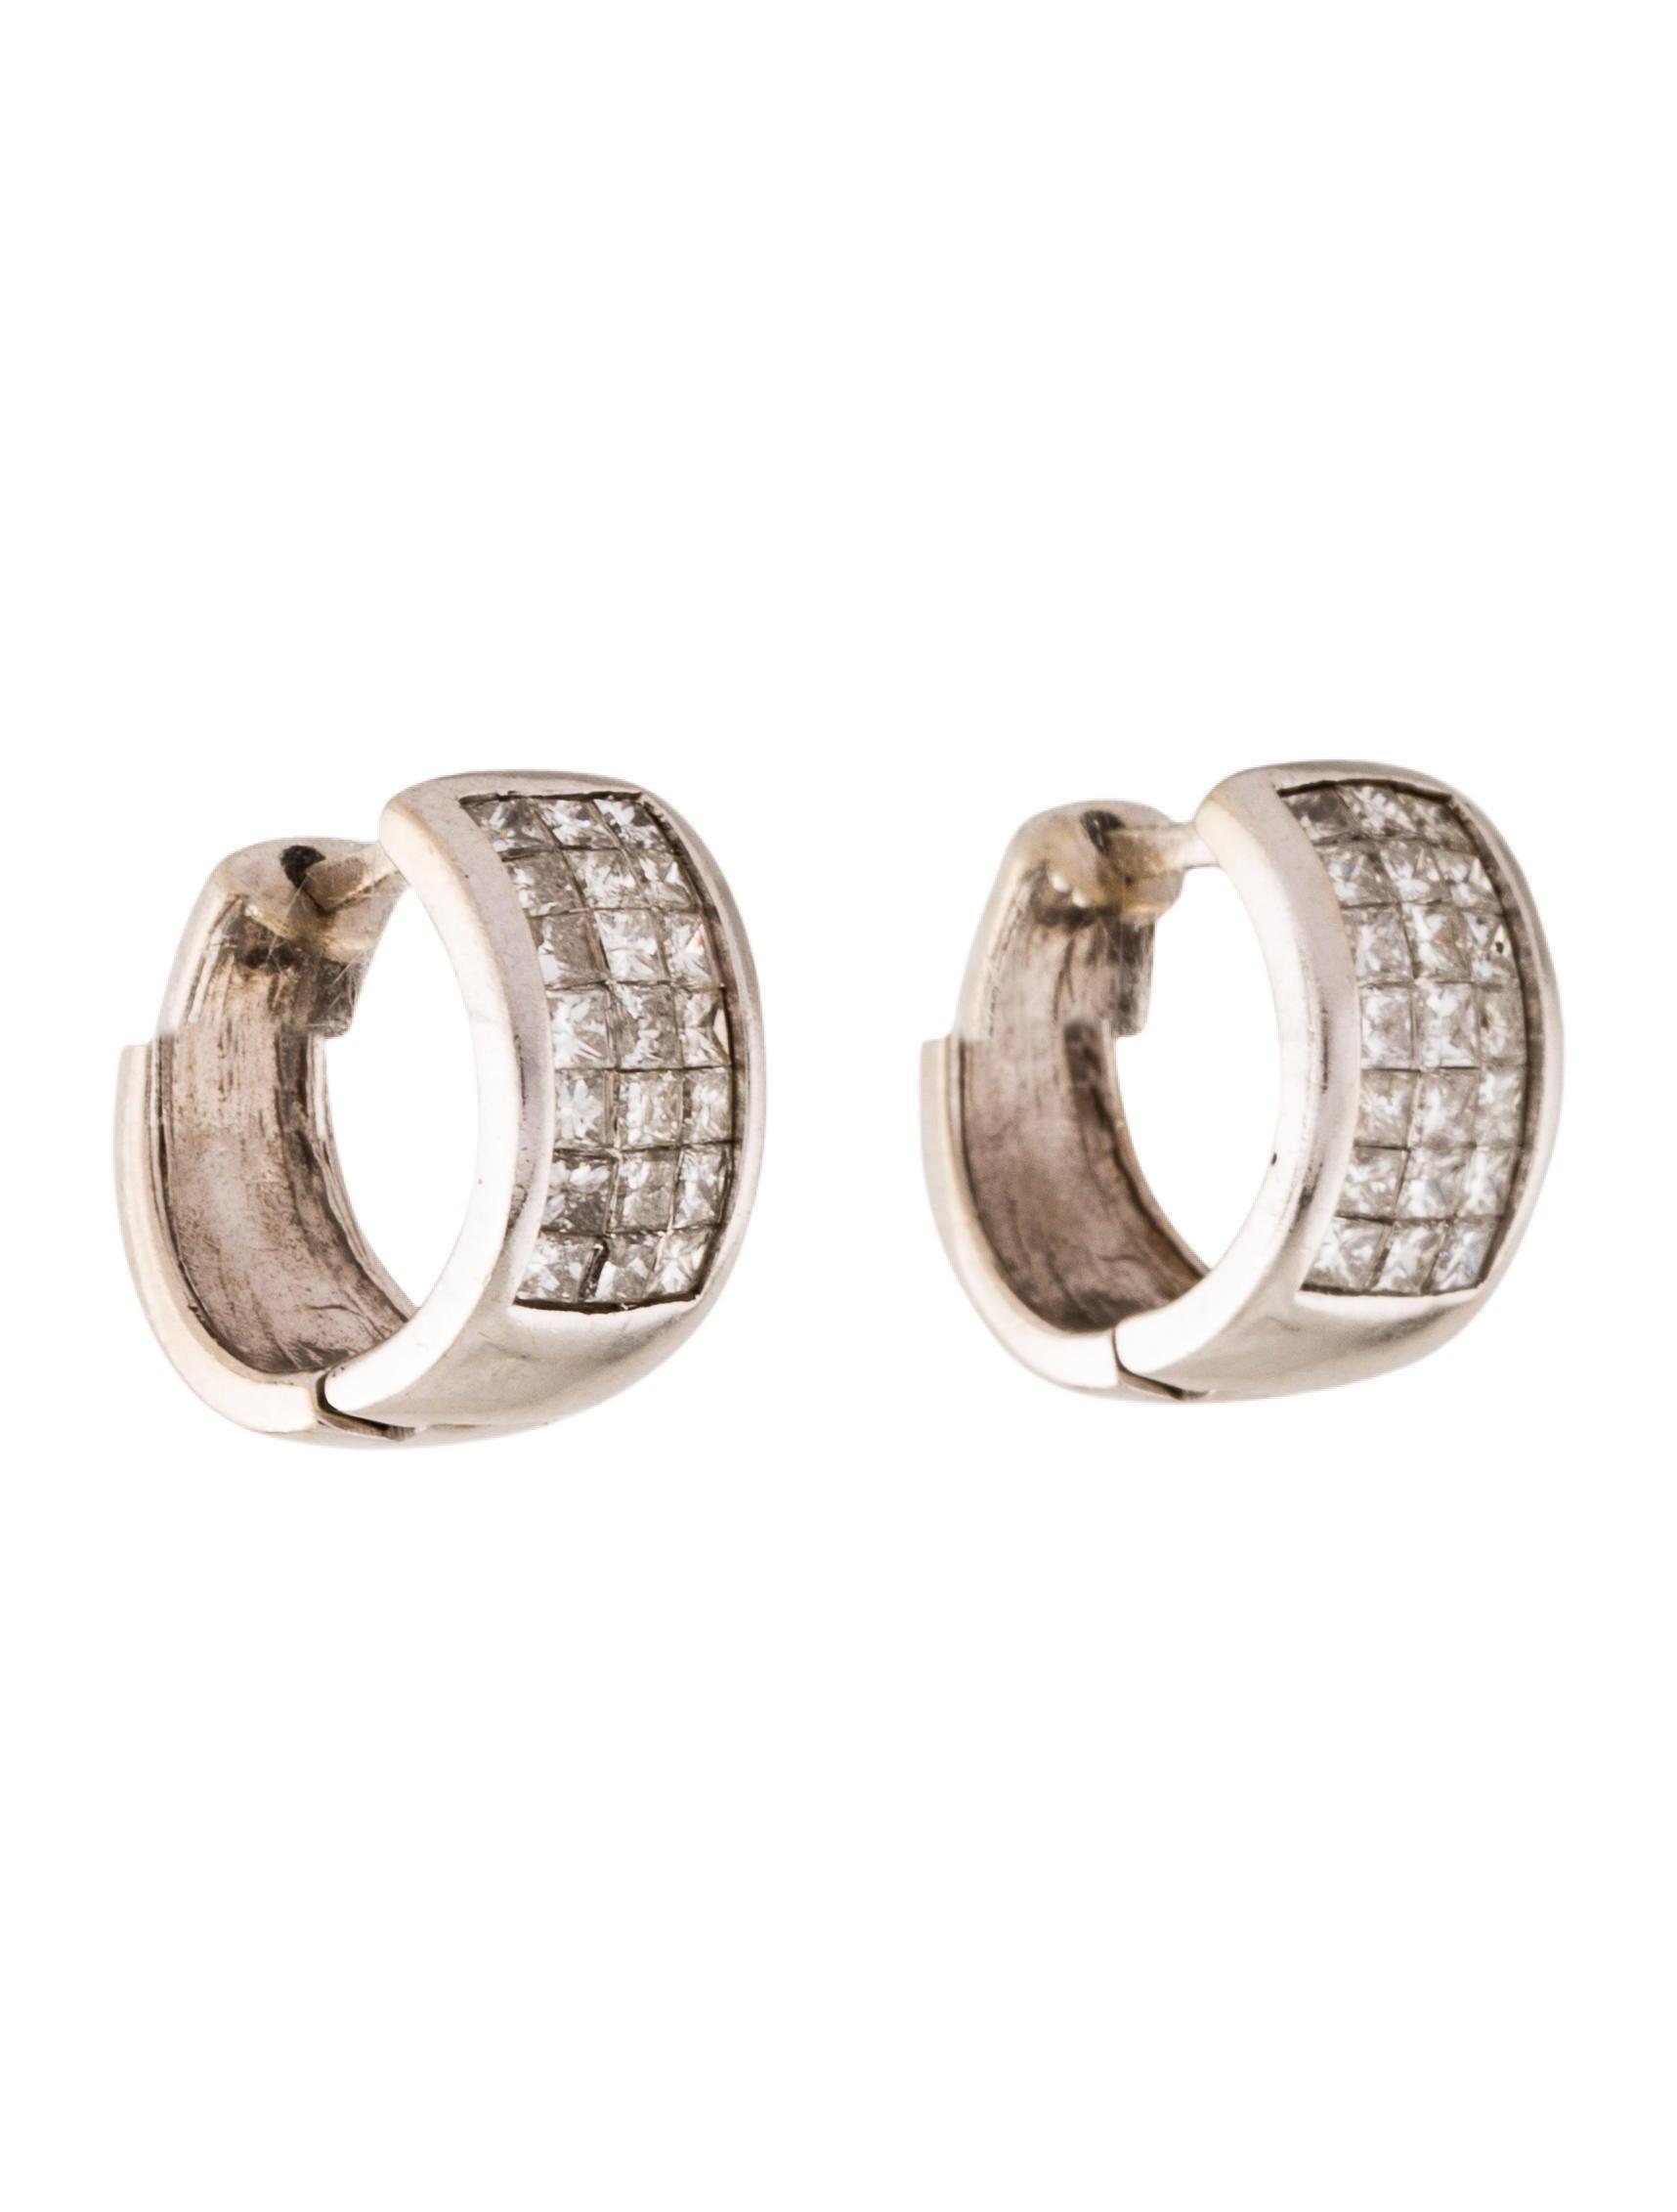 14k diamond huggies earrings earri38141 the realreal. Black Bedroom Furniture Sets. Home Design Ideas